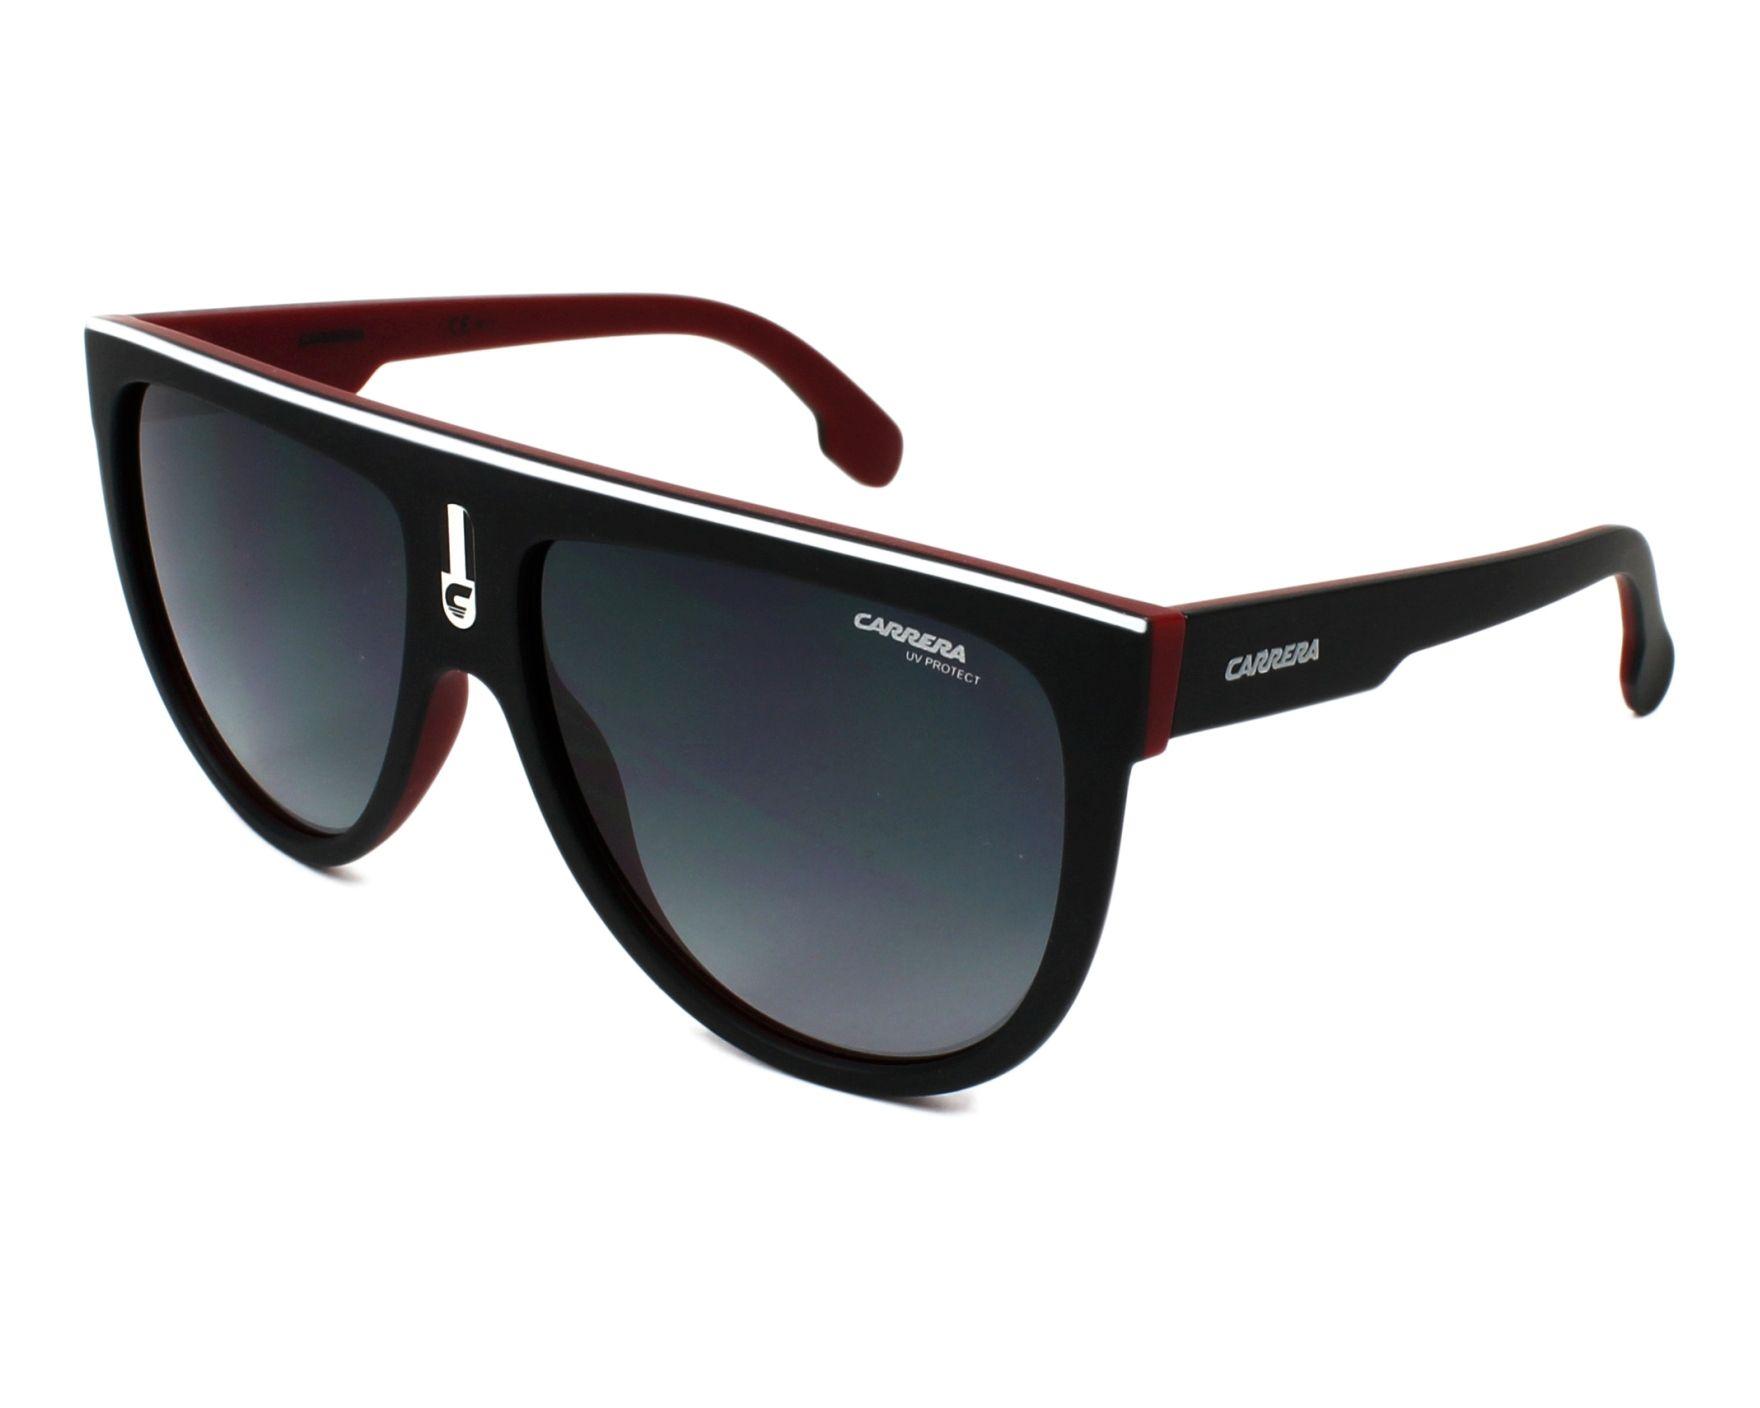 21bee87e1d Sunglasses Carrera FLAGTOP BLX 9O 60-15 Black Bordeaux profile view